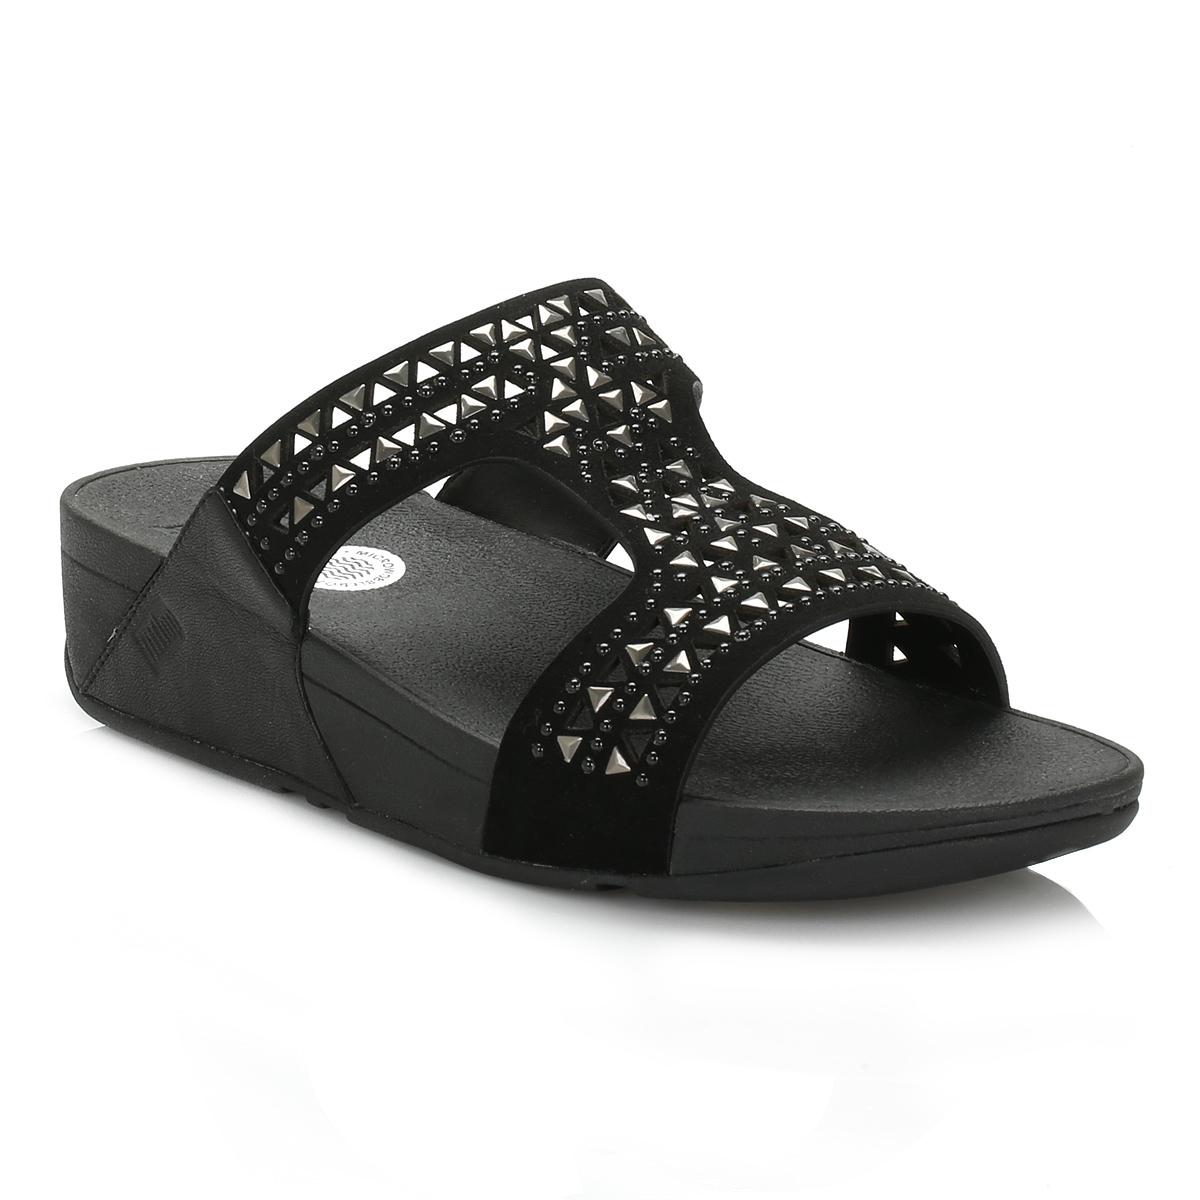 Fantastic Arizona Jean Company Arizona Jean Company Jelly Women Black Slides Sandal Sandals